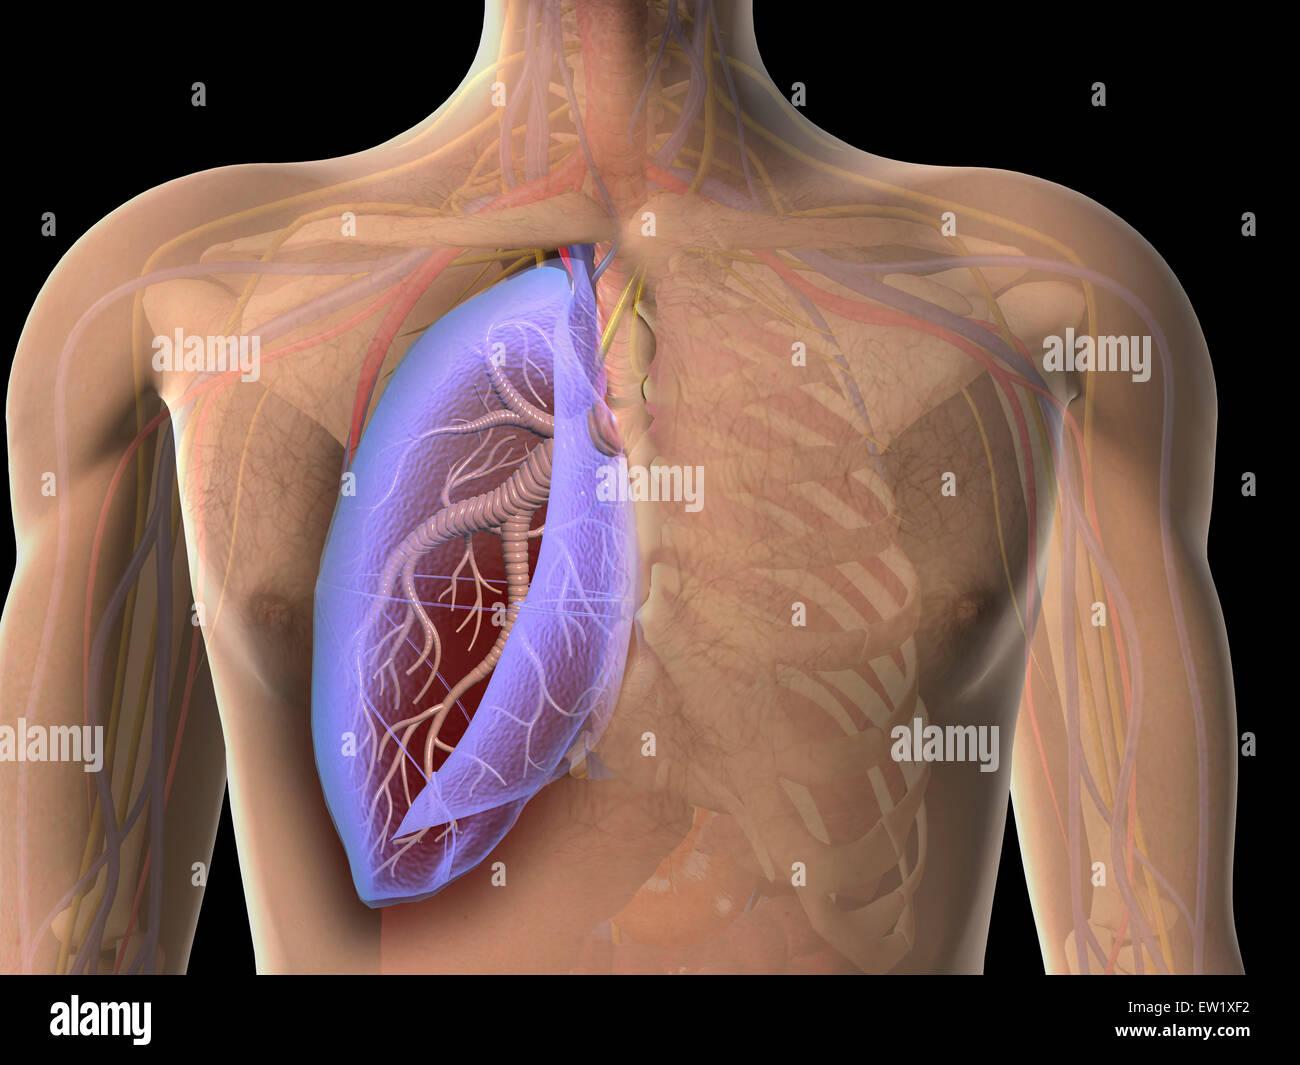 Upper Respiratory Anatomy Stockfotos & Upper Respiratory Anatomy ...